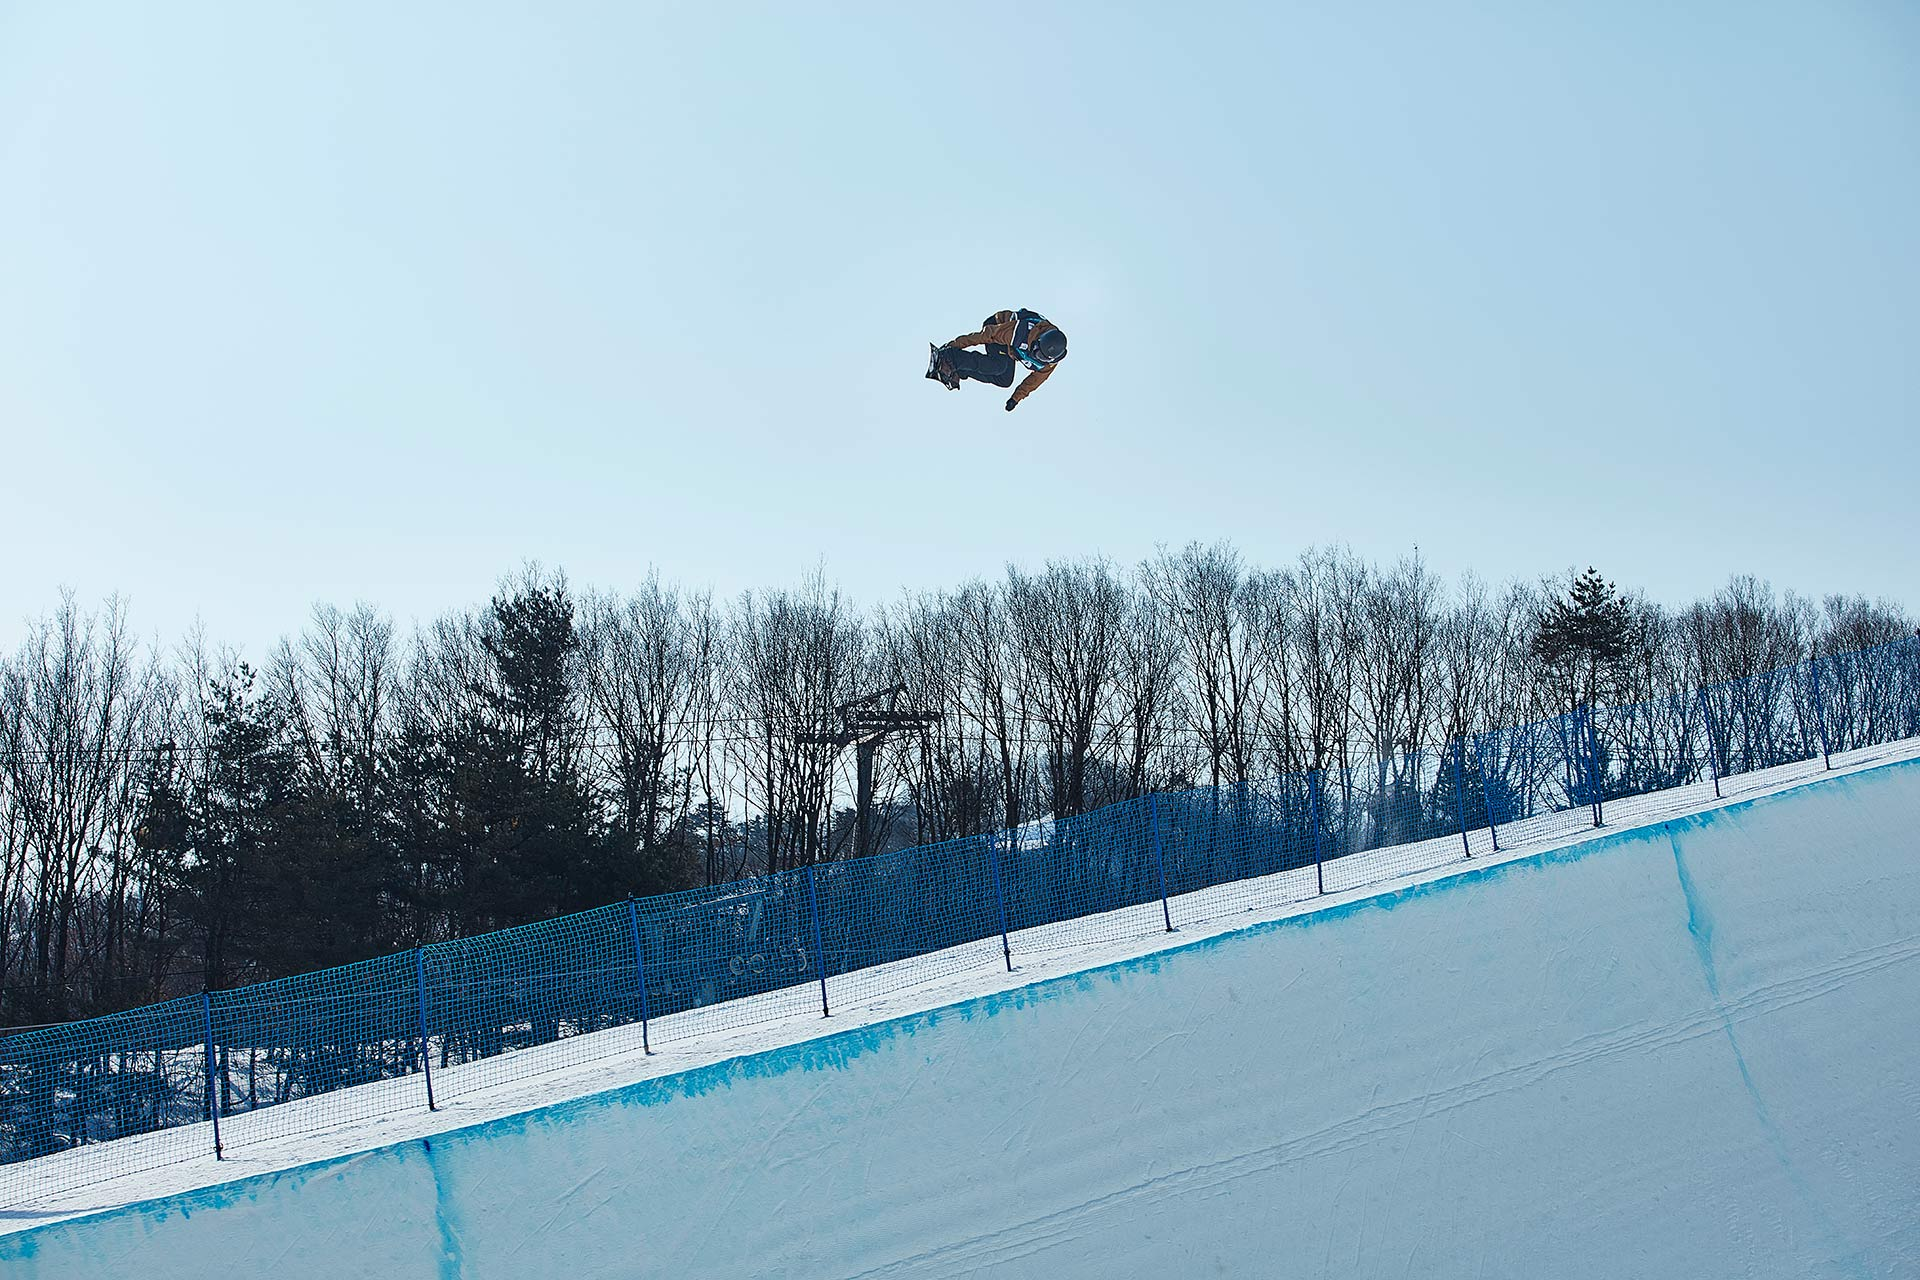 Zhang Yiwei,2018 winter olympics,pyongchang,Korea,snowboard,halfpipe